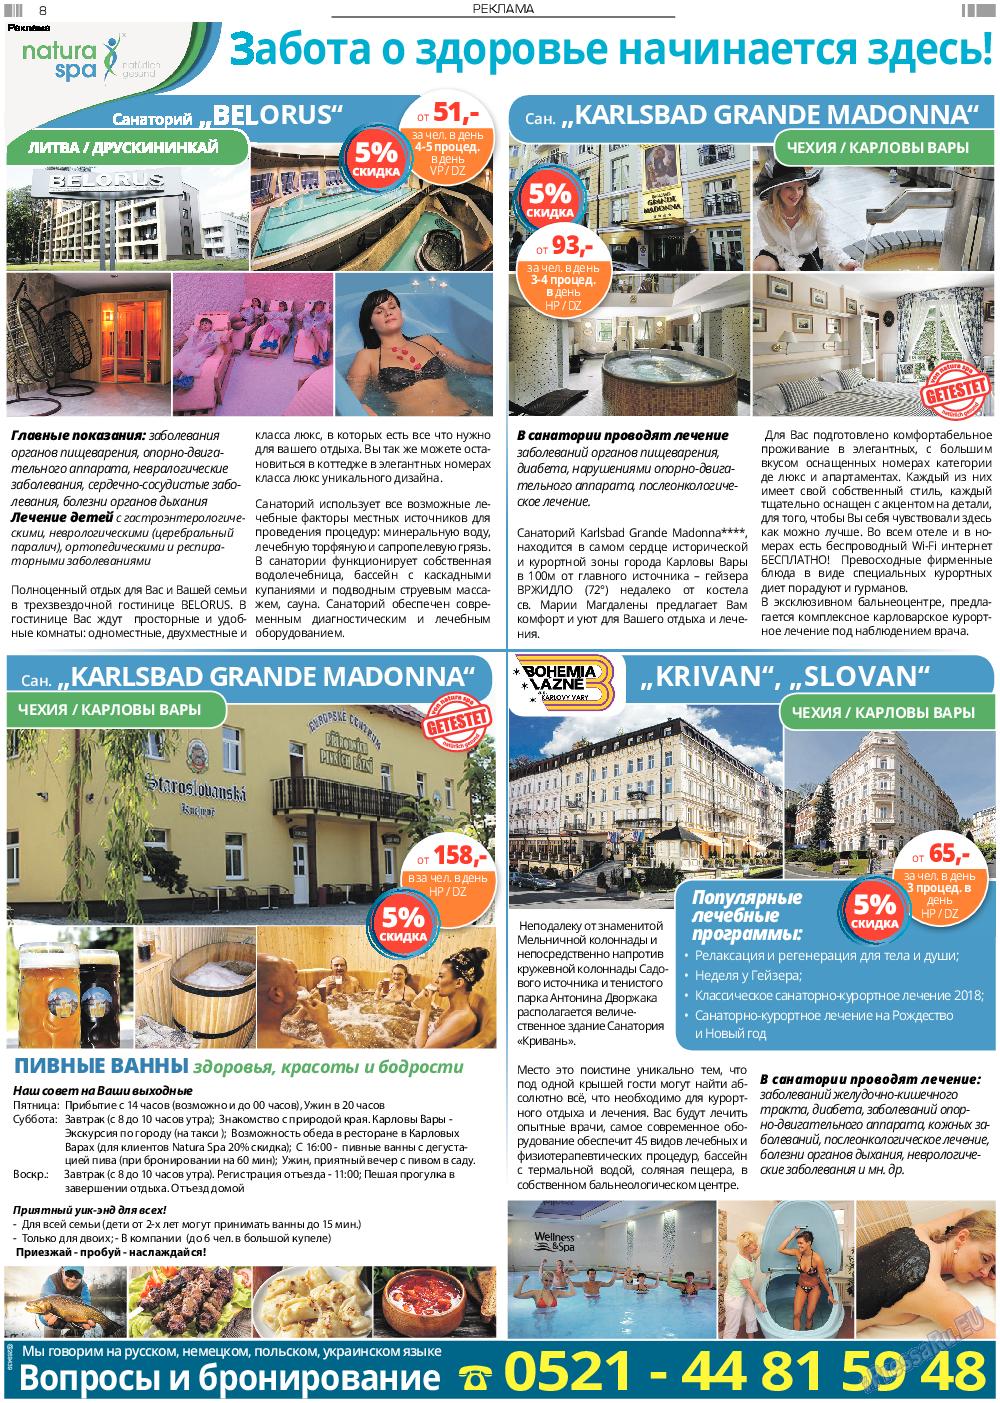 Анонс (газета). 2018 год, номер 7, стр. 8